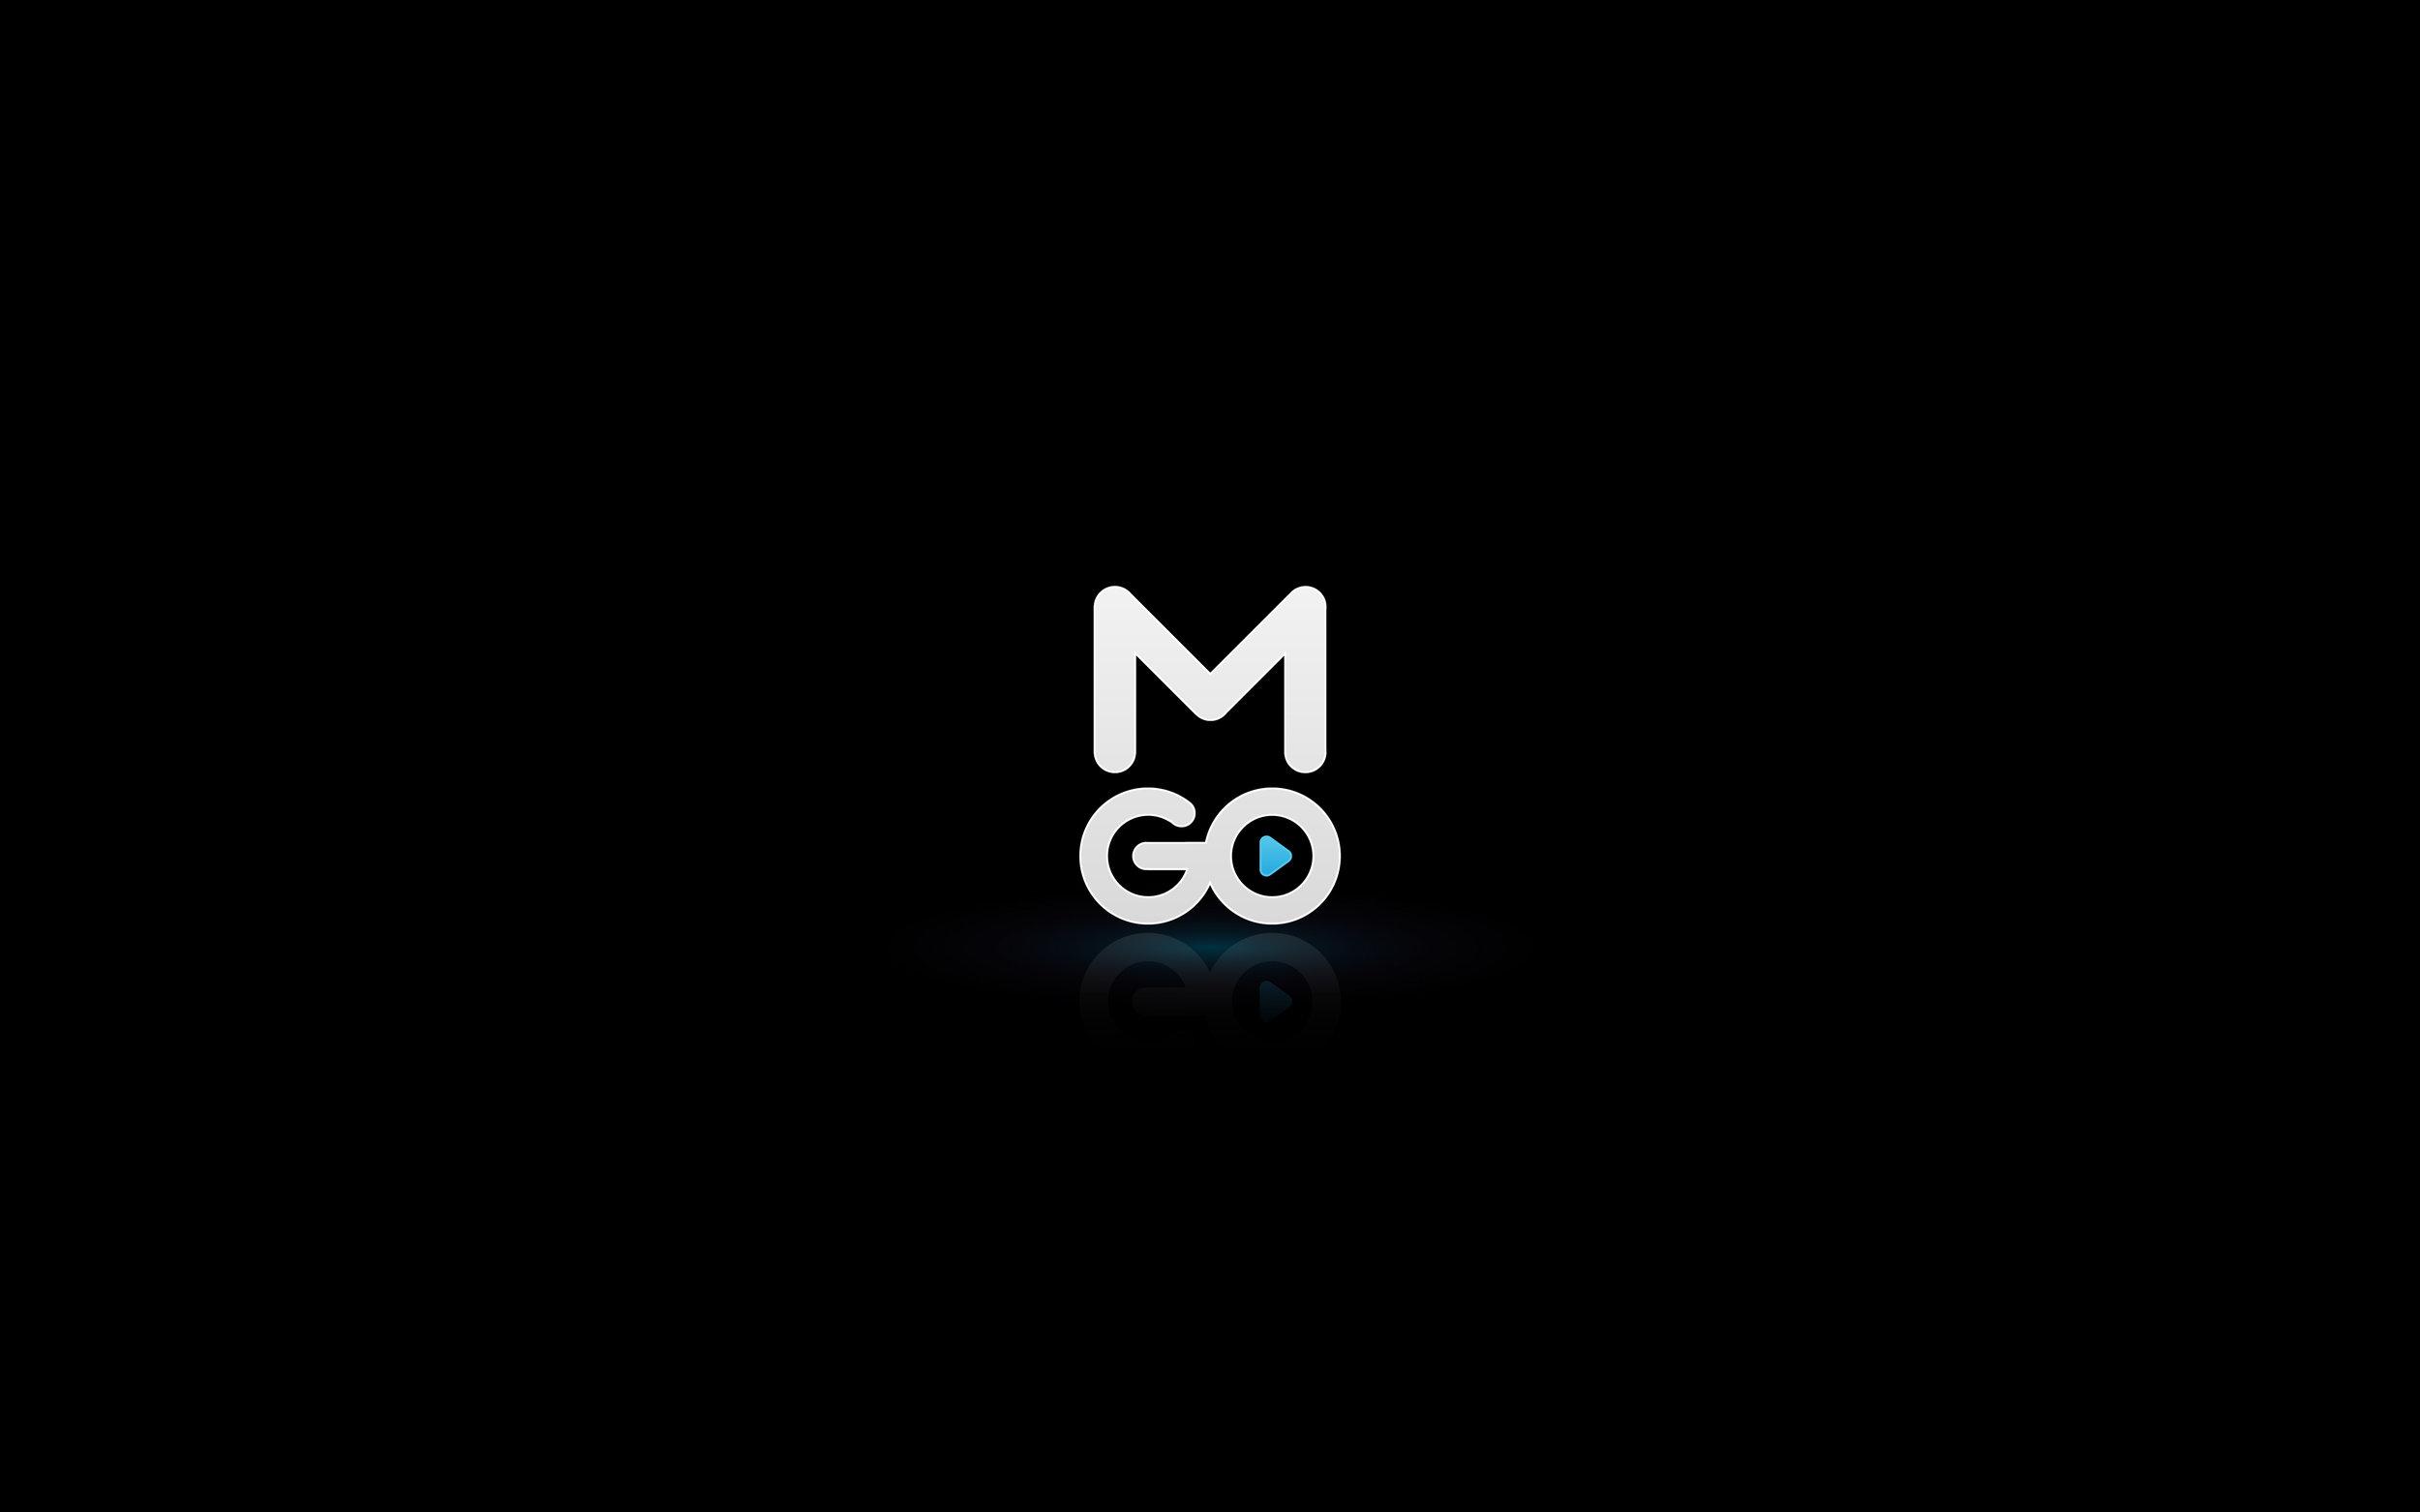 2-M-GO+Logos+C_BW-01.jpg